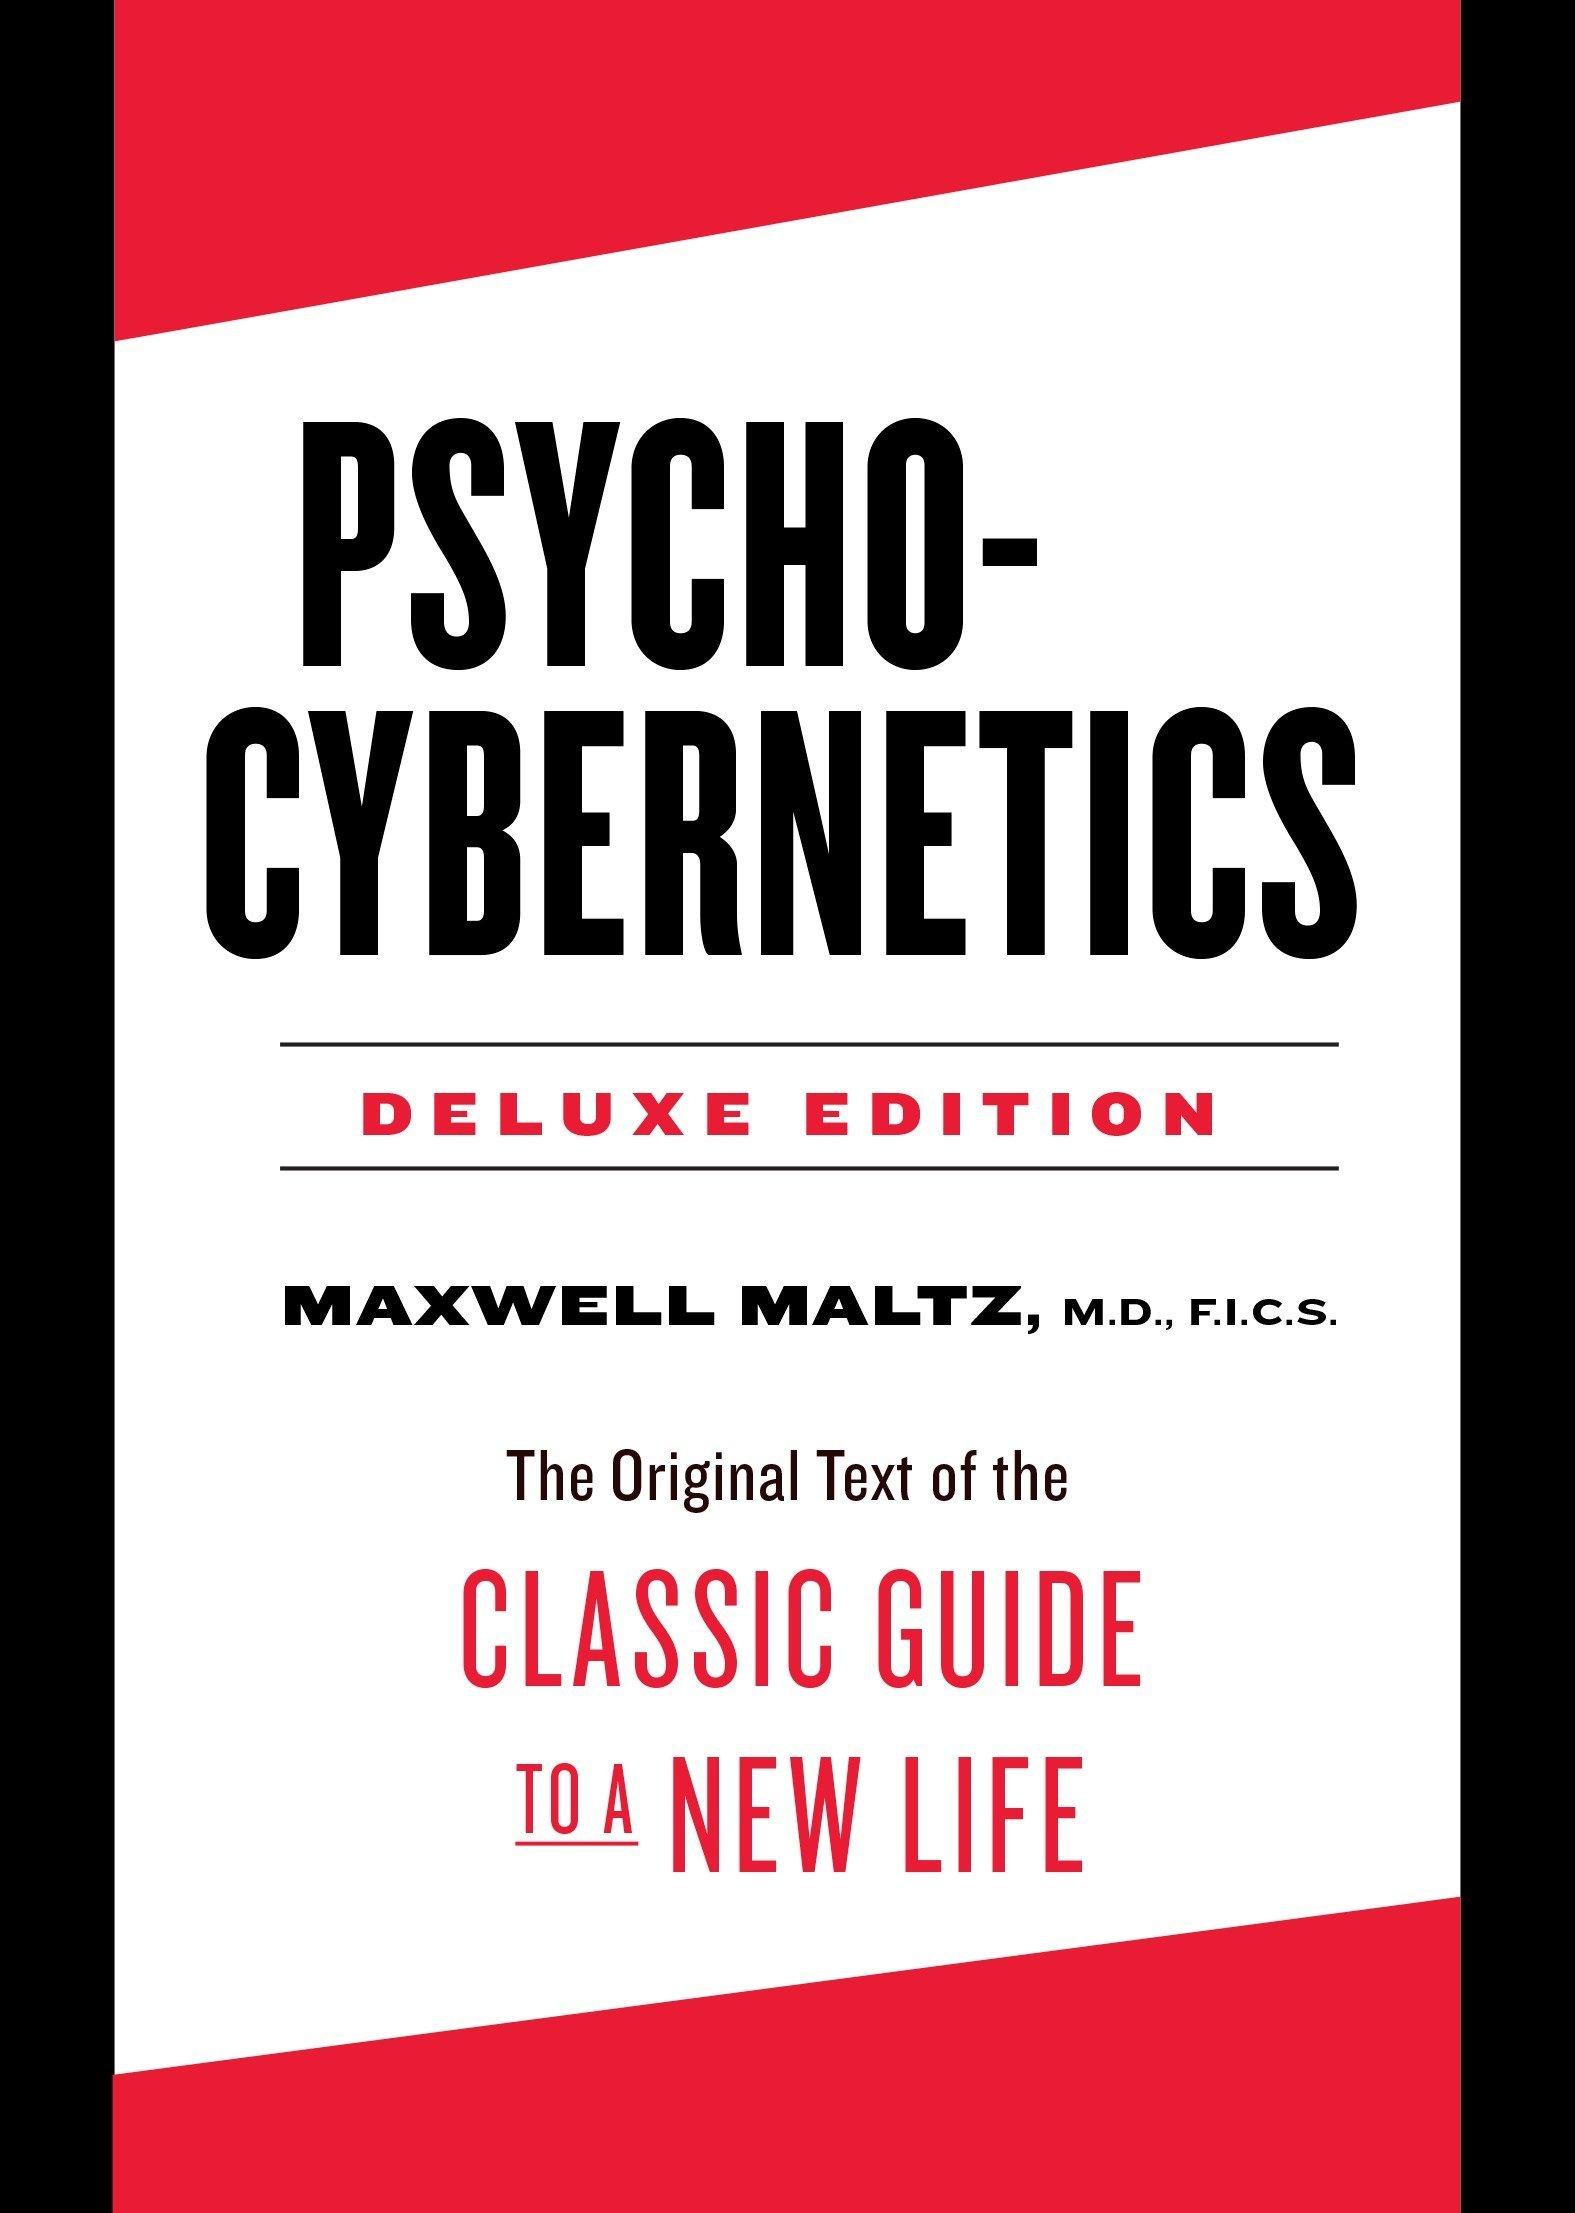 Psycho-Cybernetics Maxwell Maltz notes by Kingston S. Lim